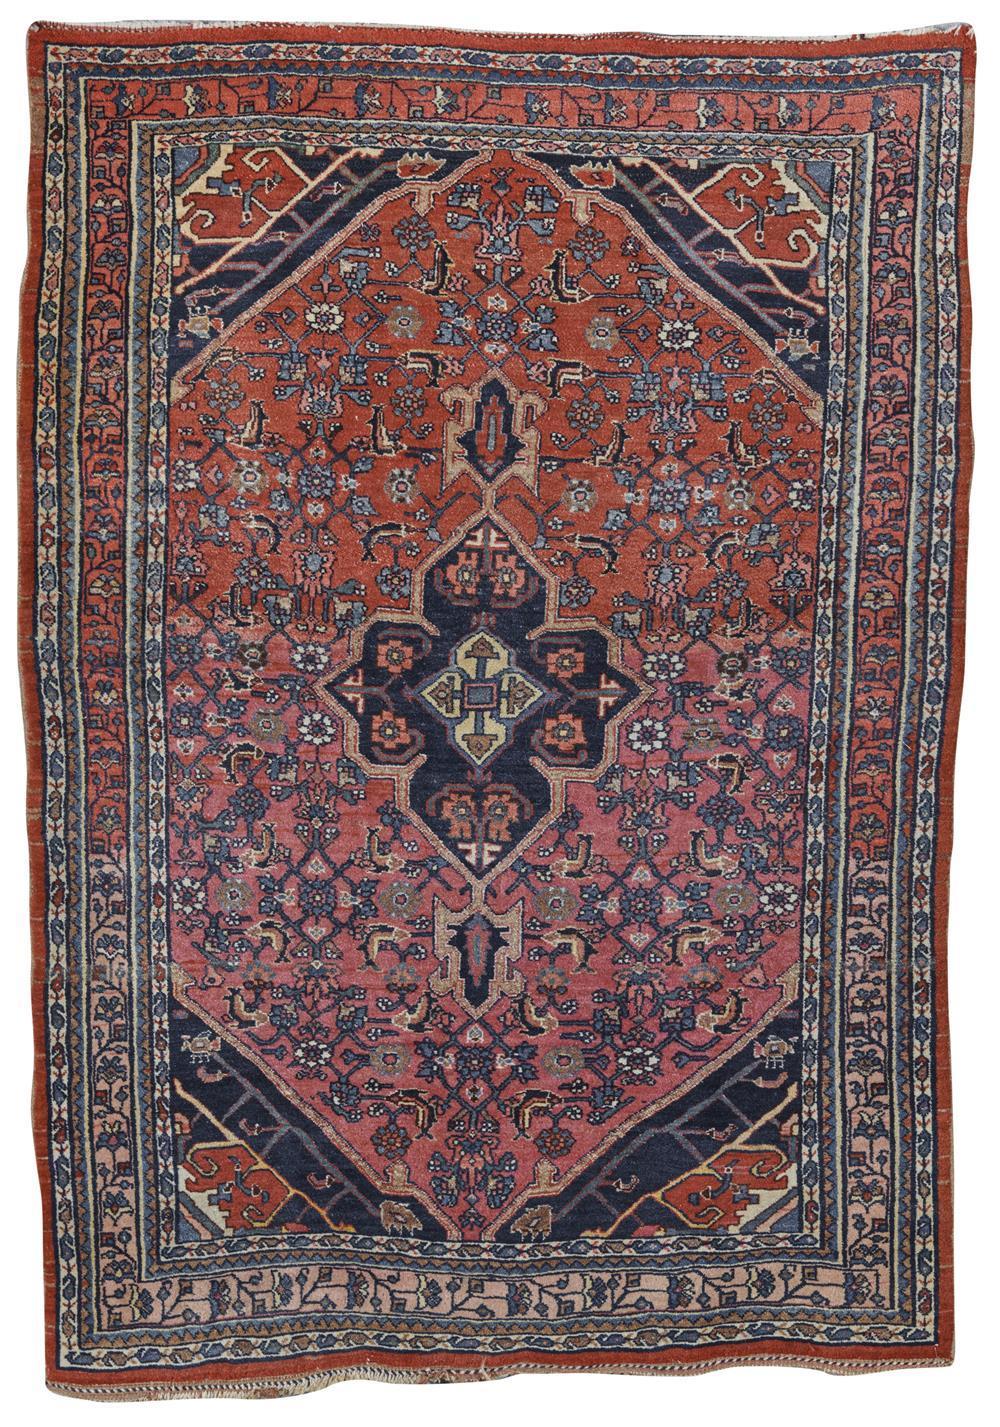 Bidjar Rug, Persia, first quarter 20th century; 5 ft. 1 in. x 3 ft. 5 in.